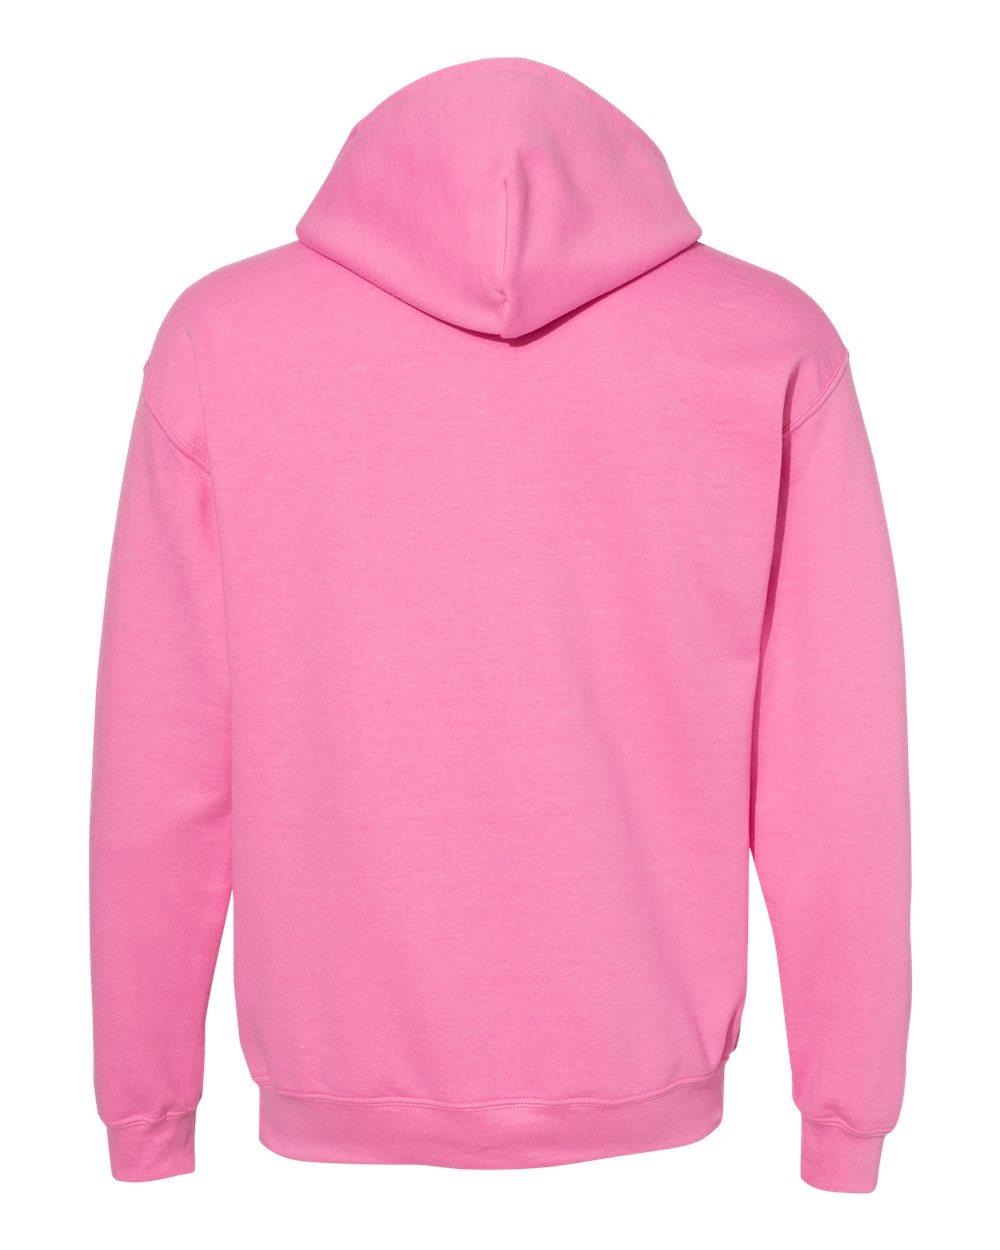 Gildan-Mens-Blank-Hoodie-Heavy-Blend-Hooded-Sweatshirt-Solid-18500-up-to-5XL thumbnail 7